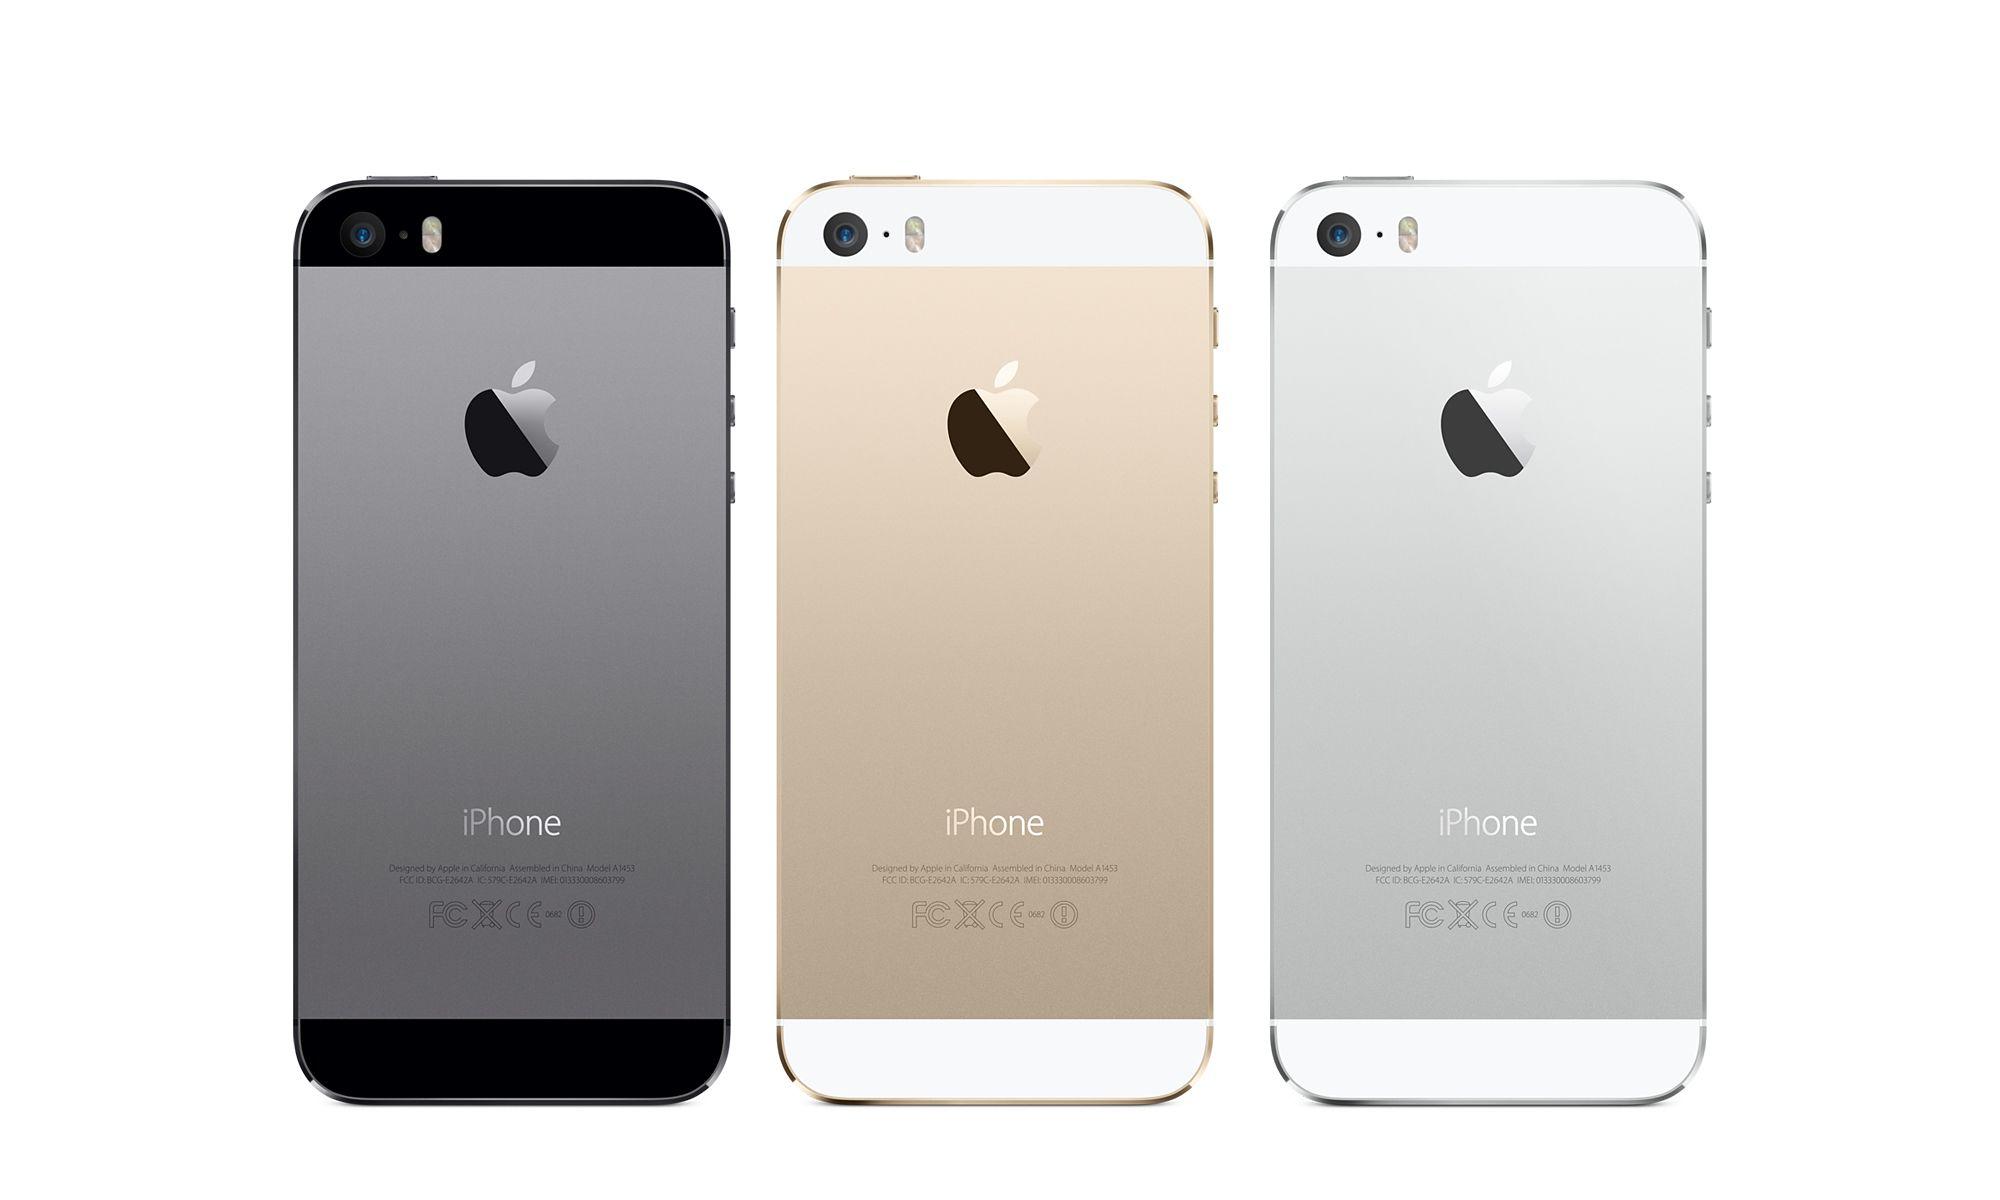 AppleのiPhoneが最も検索されたテック系のキーワードにーYahoo!検索で